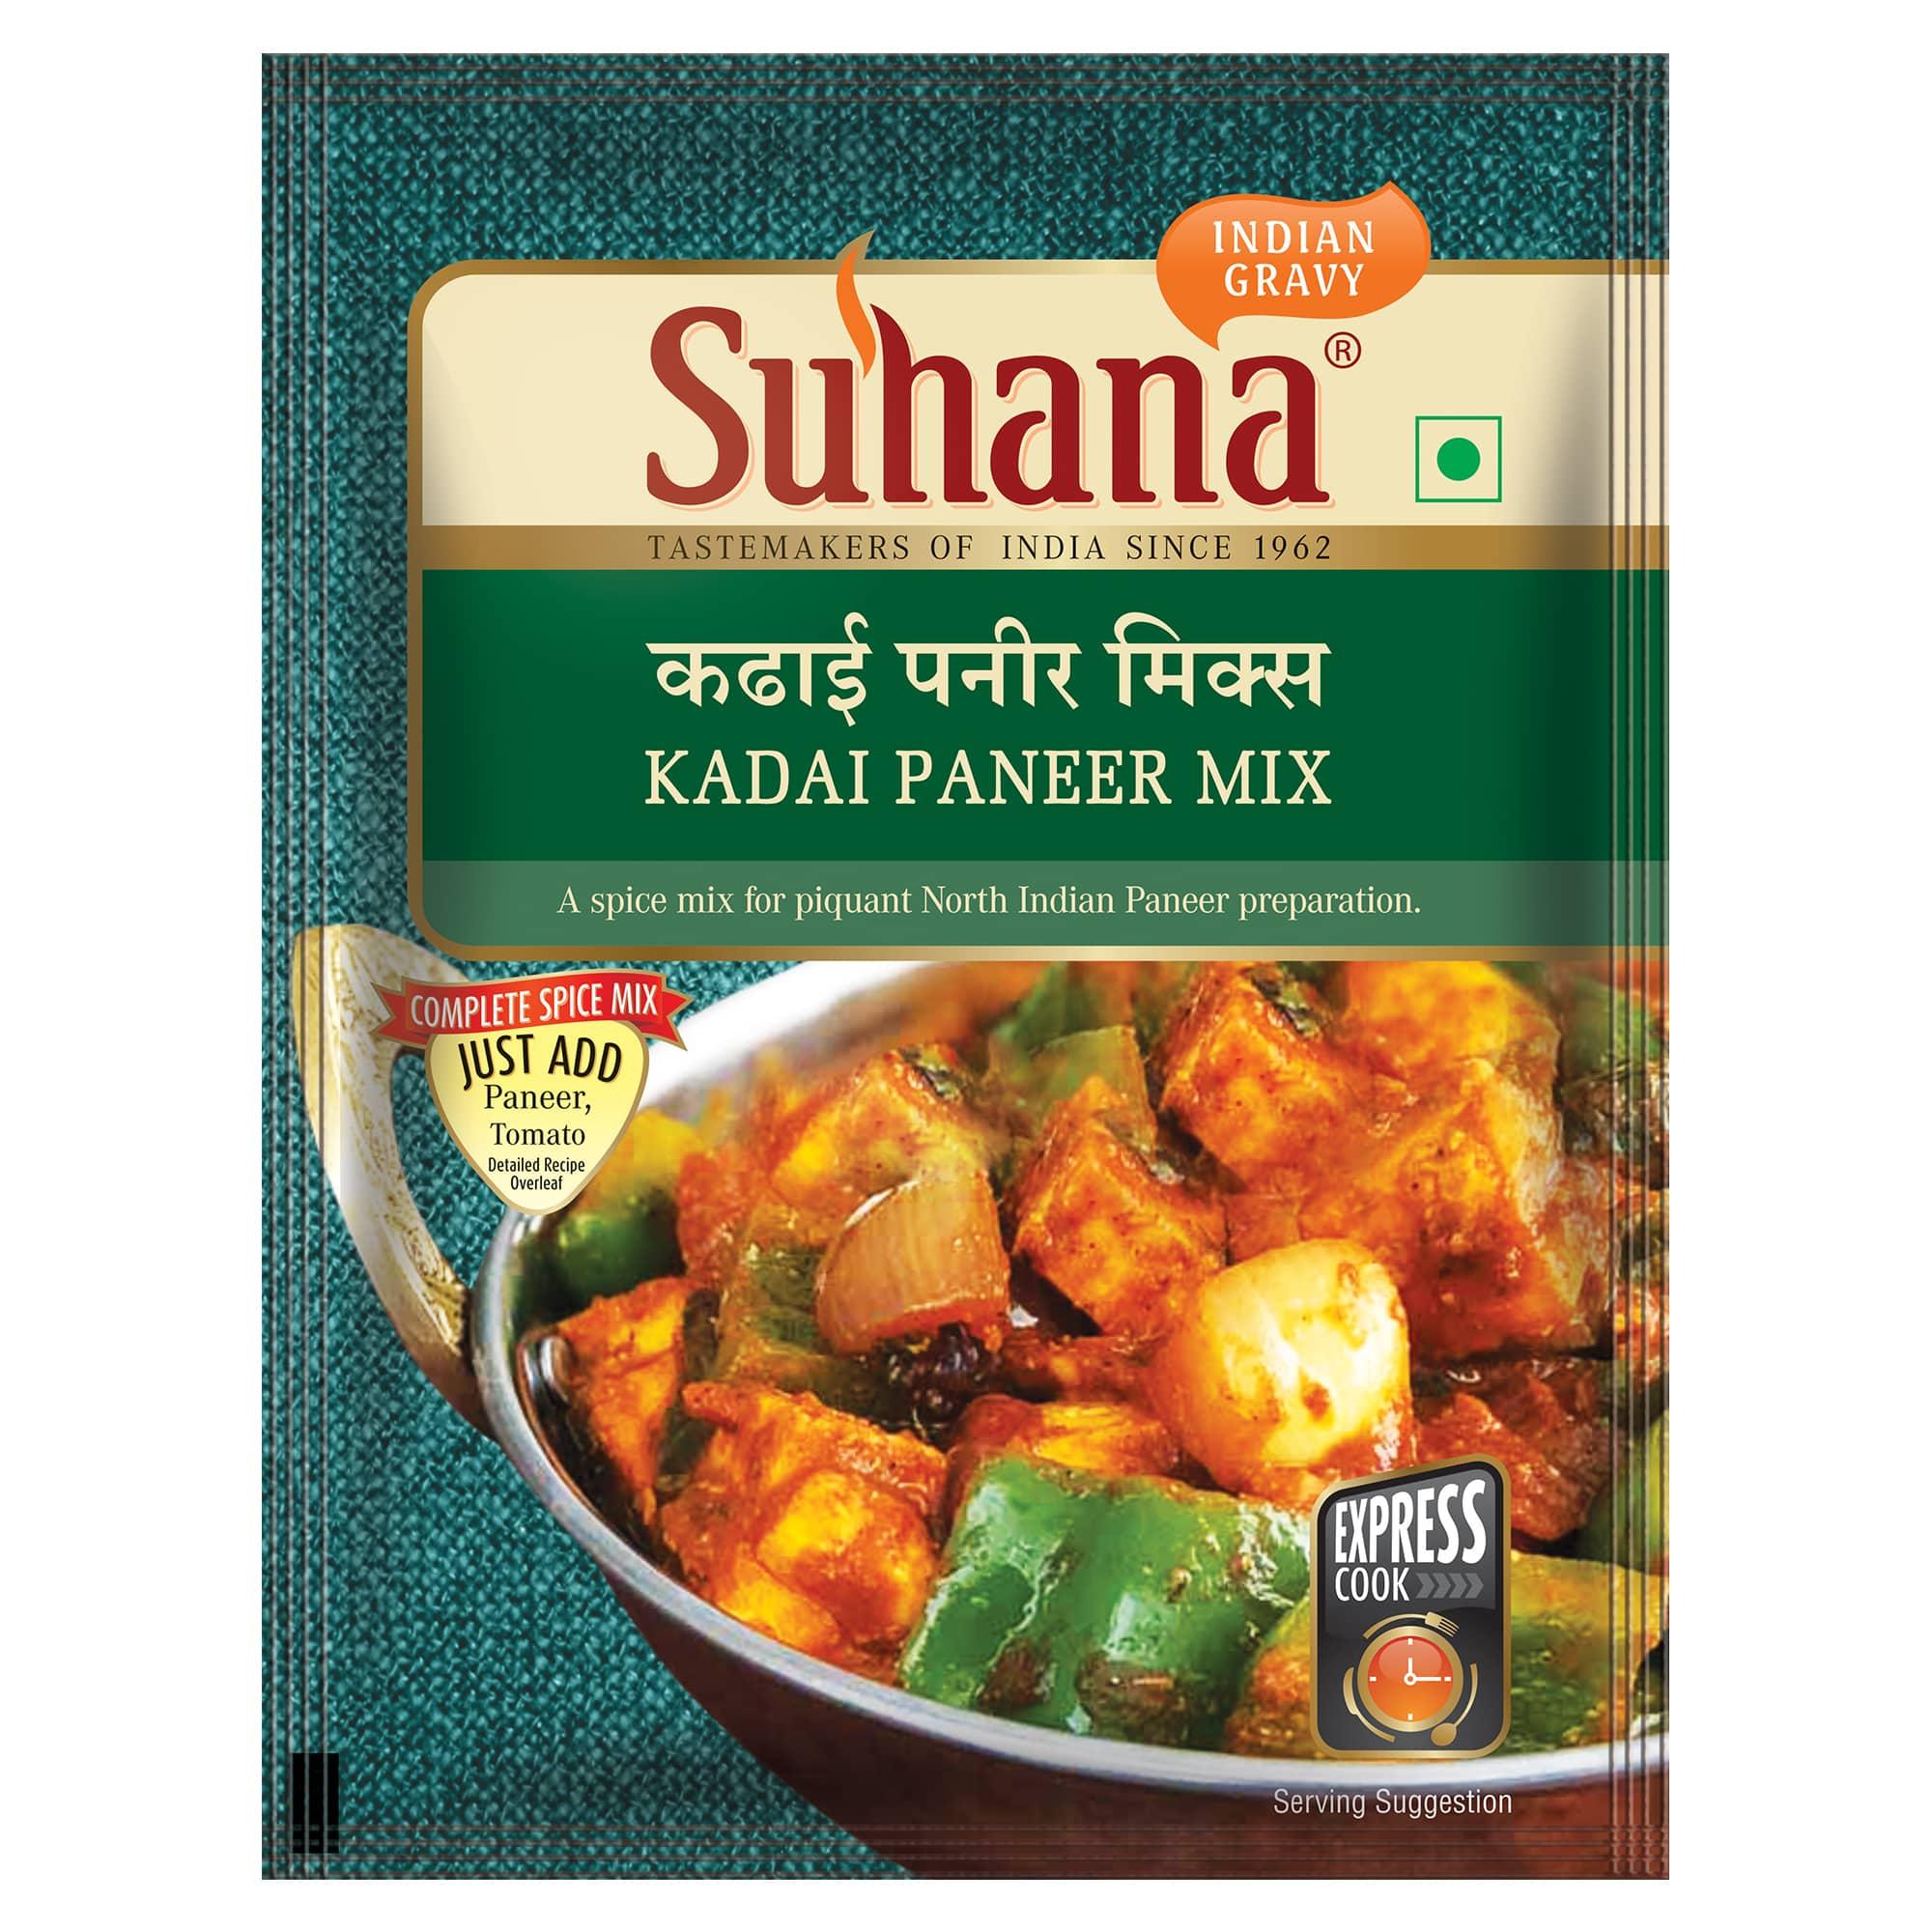 Suhana Kadai Paneer Spice Mix 50g Pouch